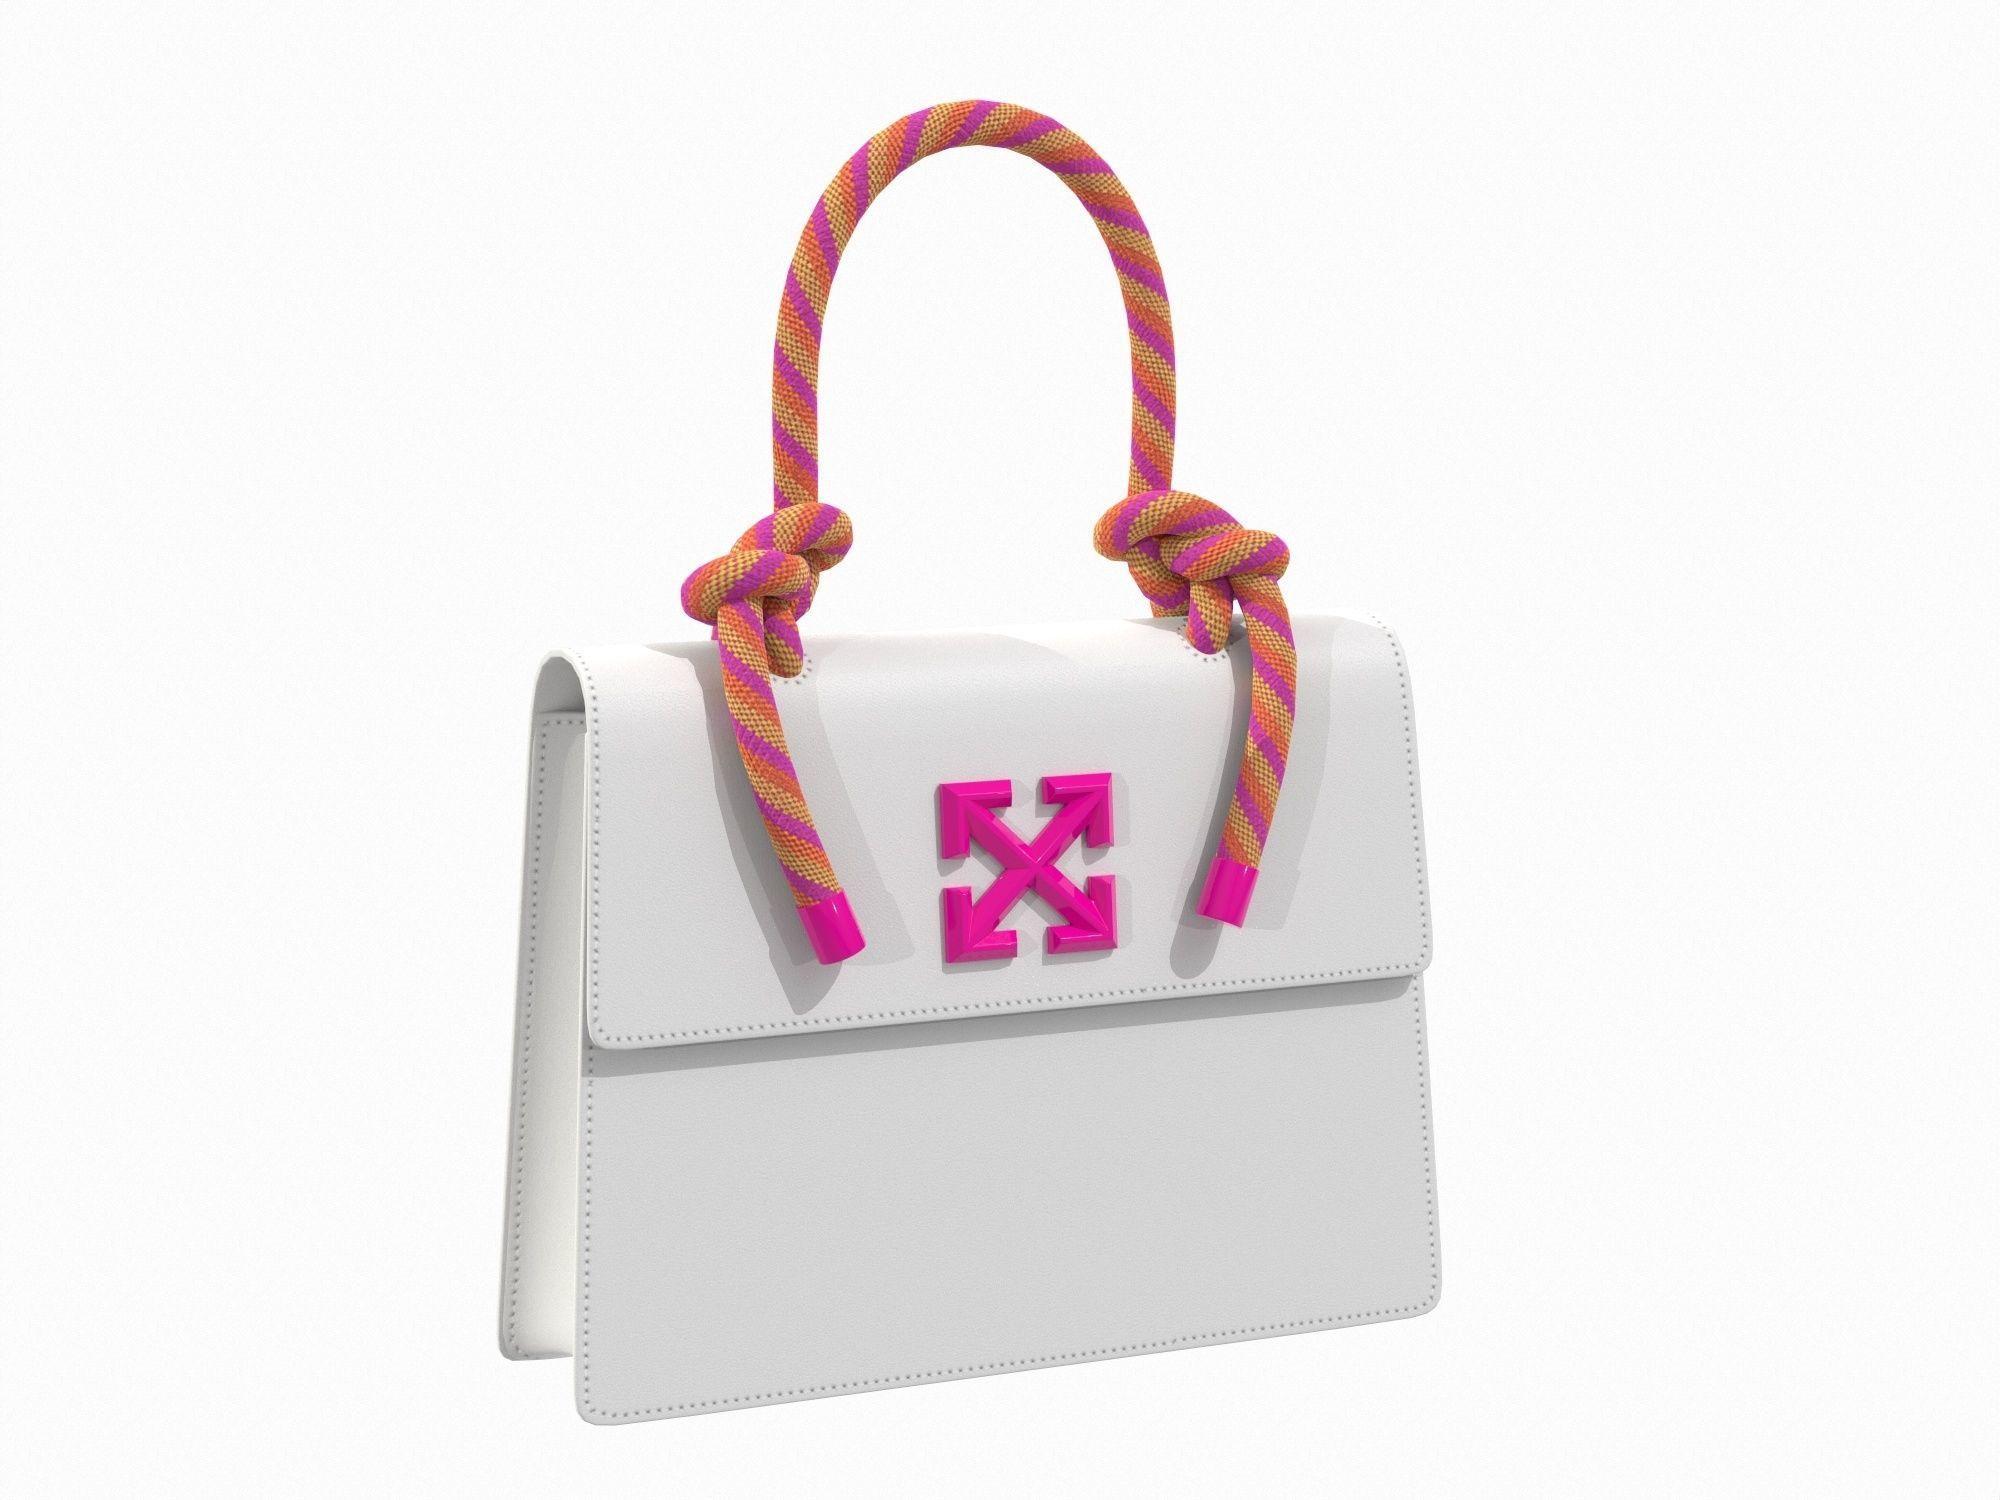 Off-White Bag Jitney Gummy White Pink